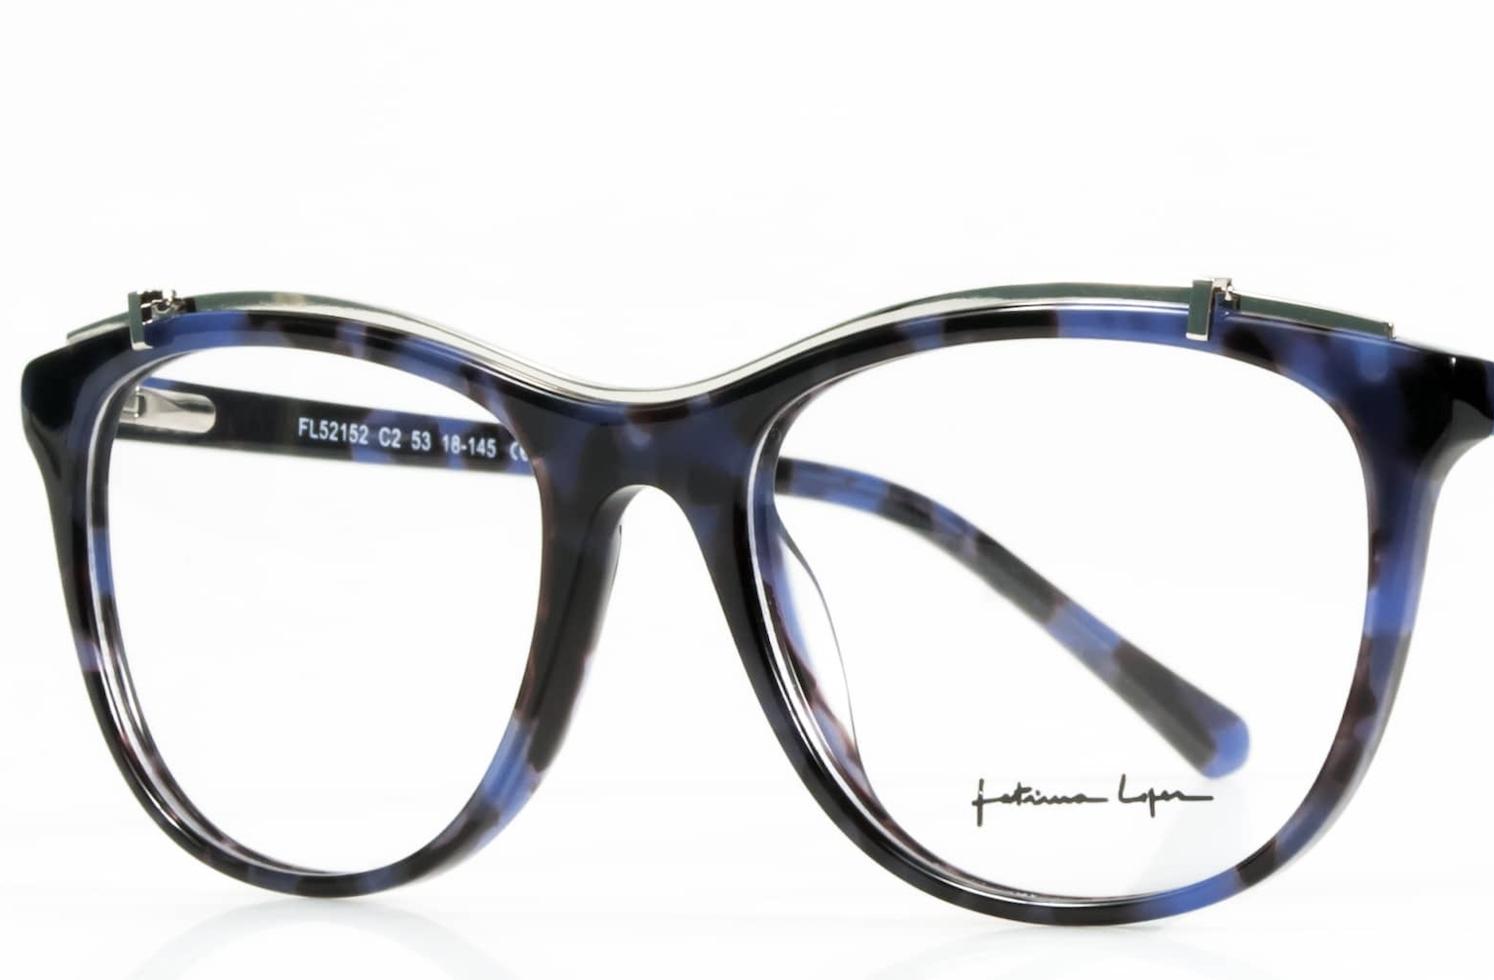 Glasses FL52152 C2 1